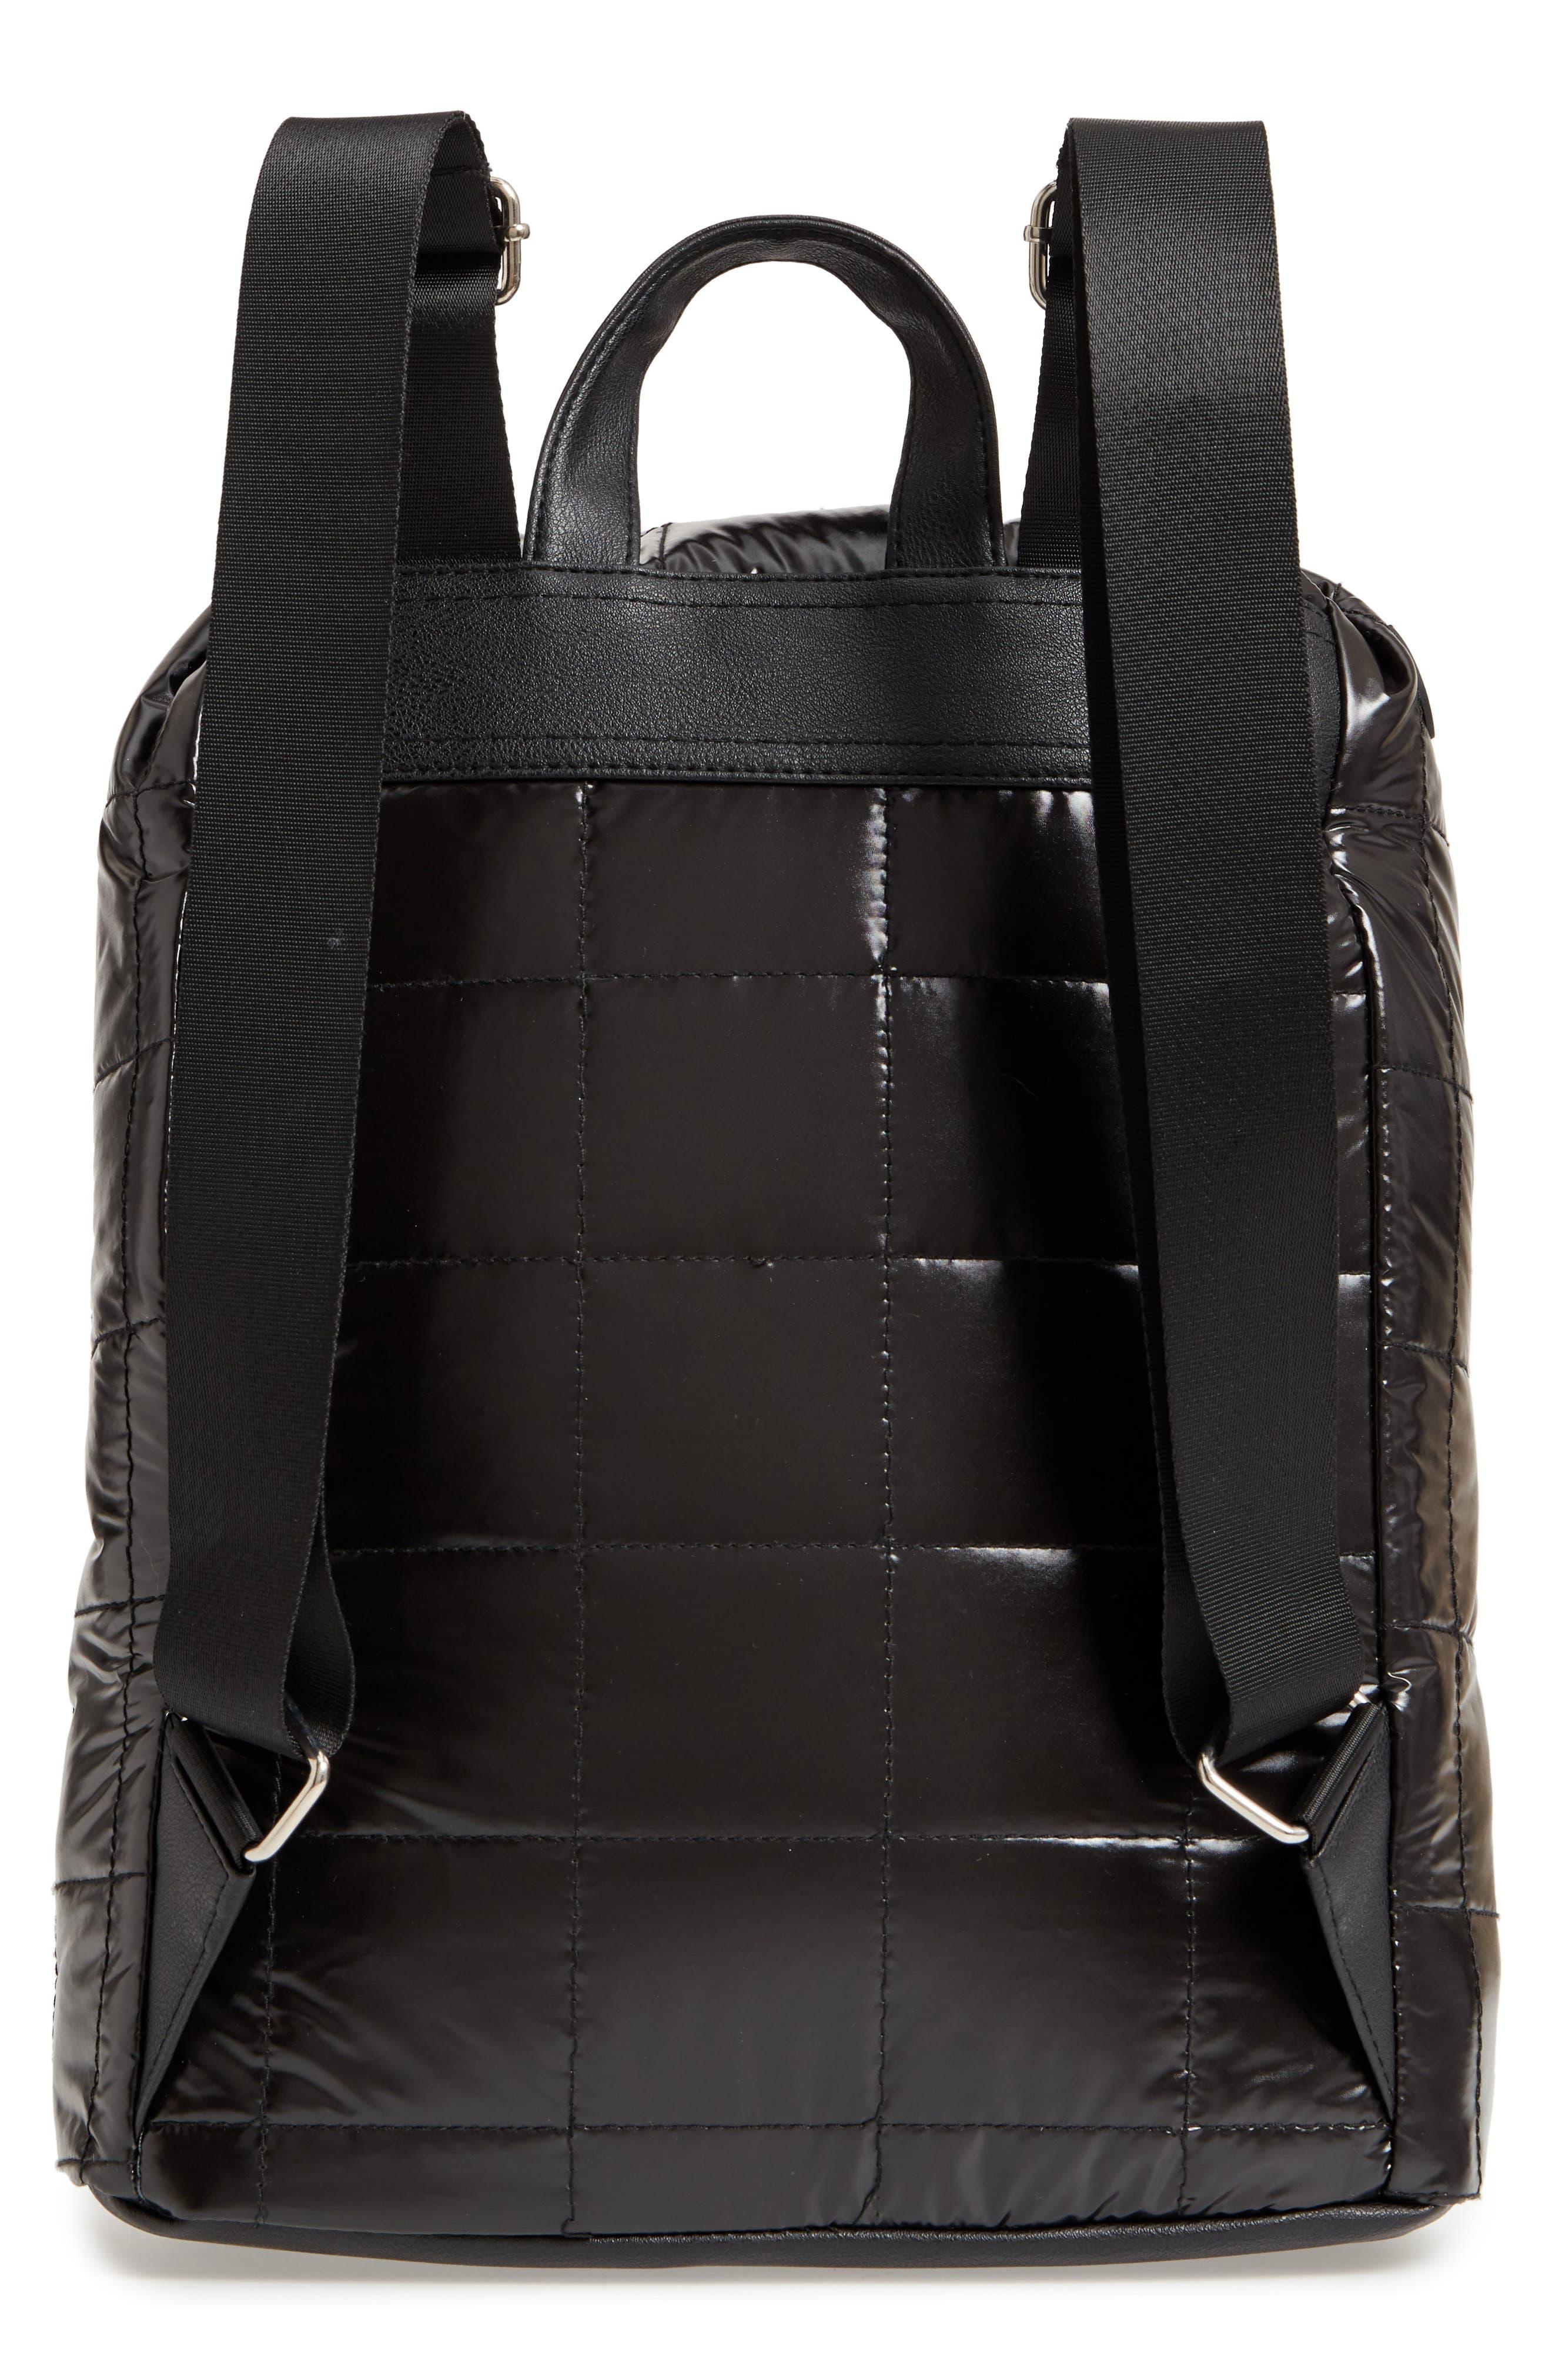 Puffer Backpack,                             Alternate thumbnail 3, color,                             001